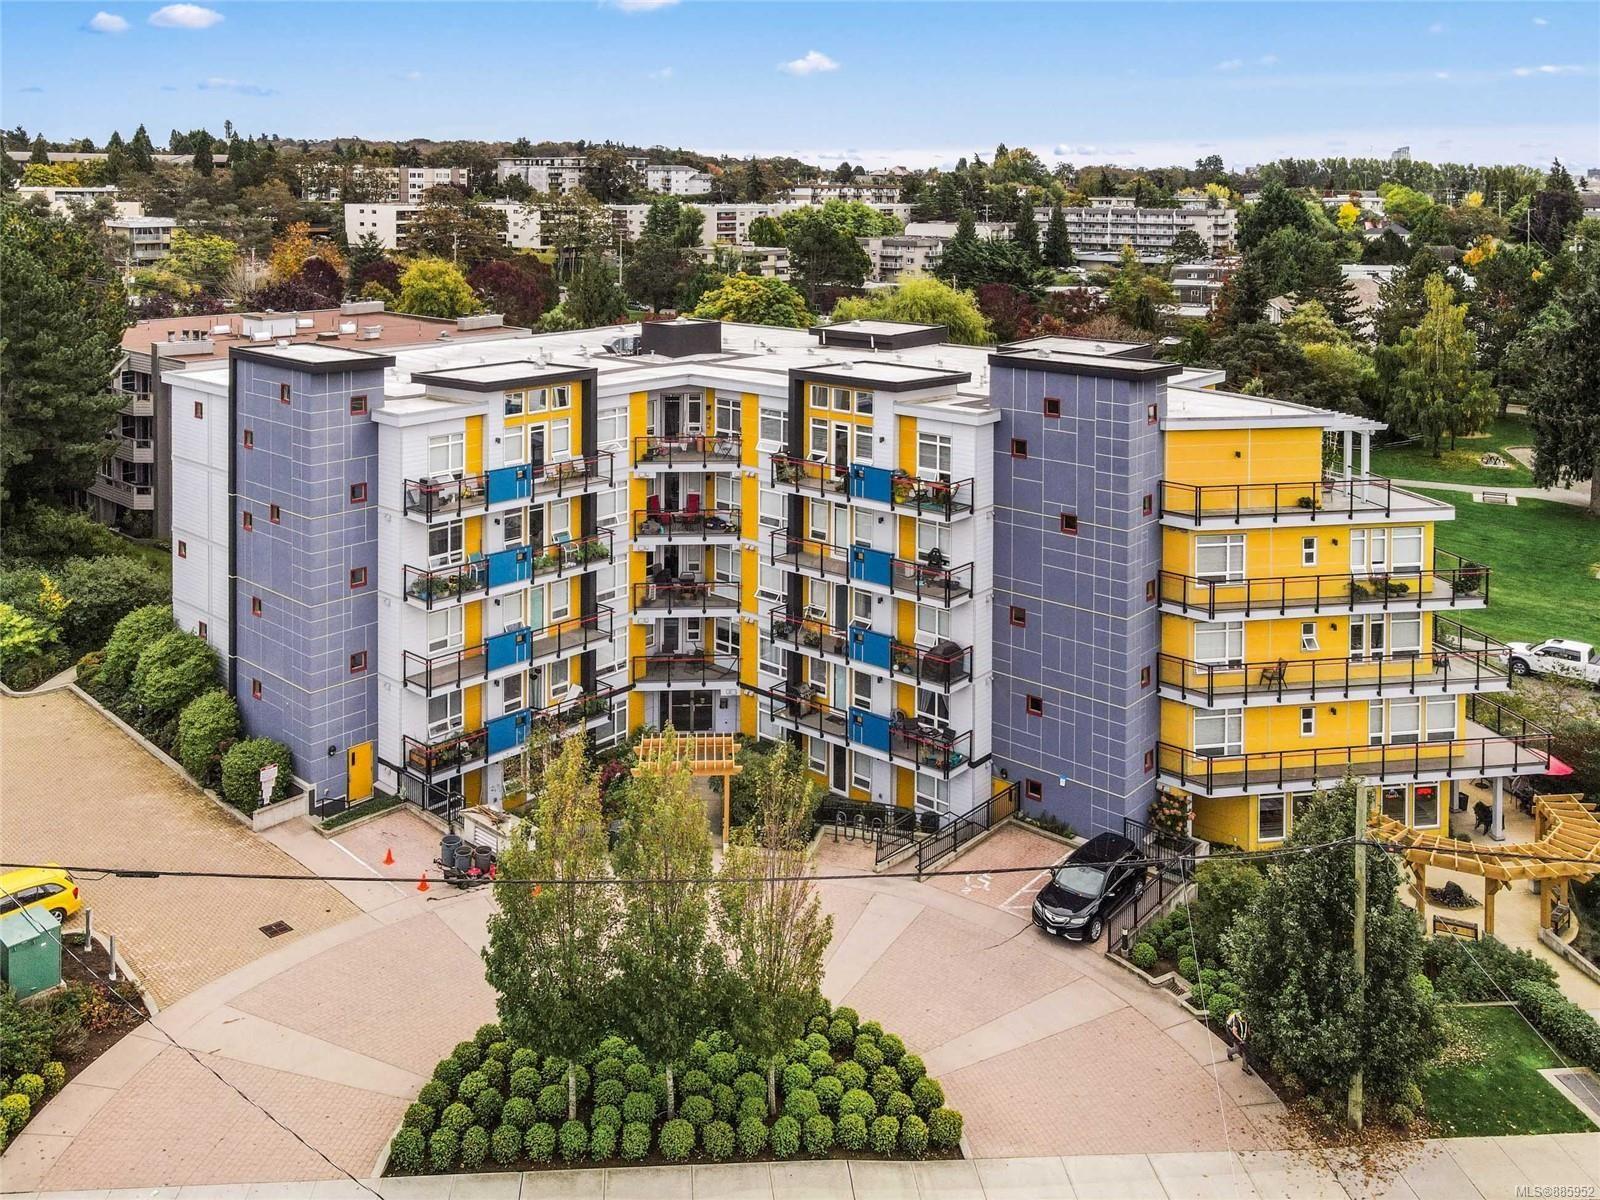 Main Photo: 508 935 Cloverdale Ave in : SE Quadra Condo for sale (Saanich East)  : MLS®# 885952